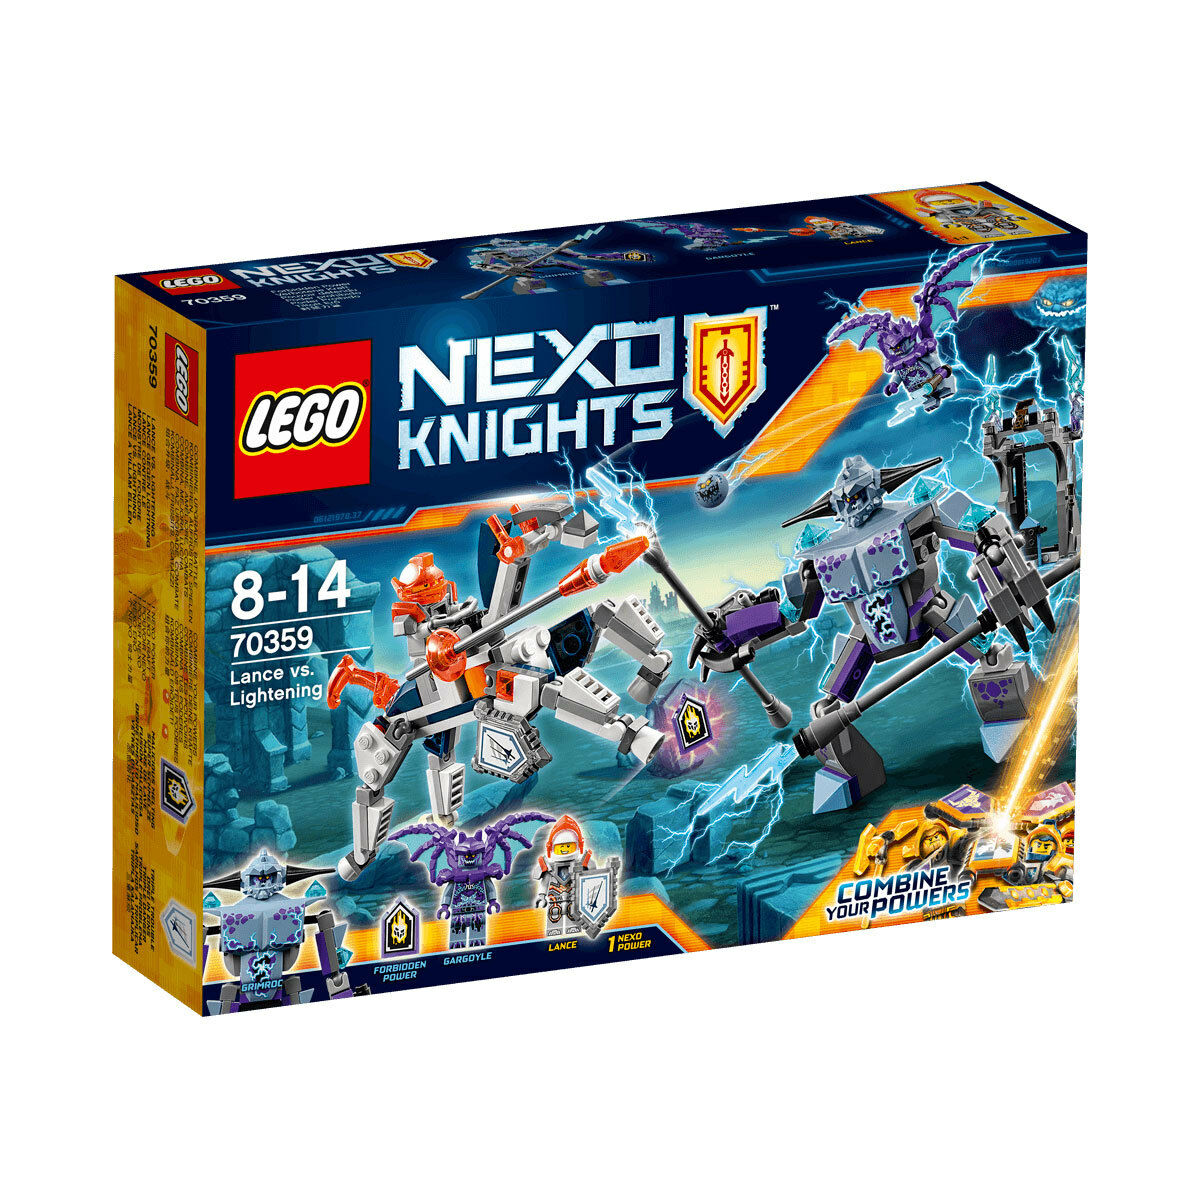 LEGO 70359 Nexo Knights Lance vs. Lightening